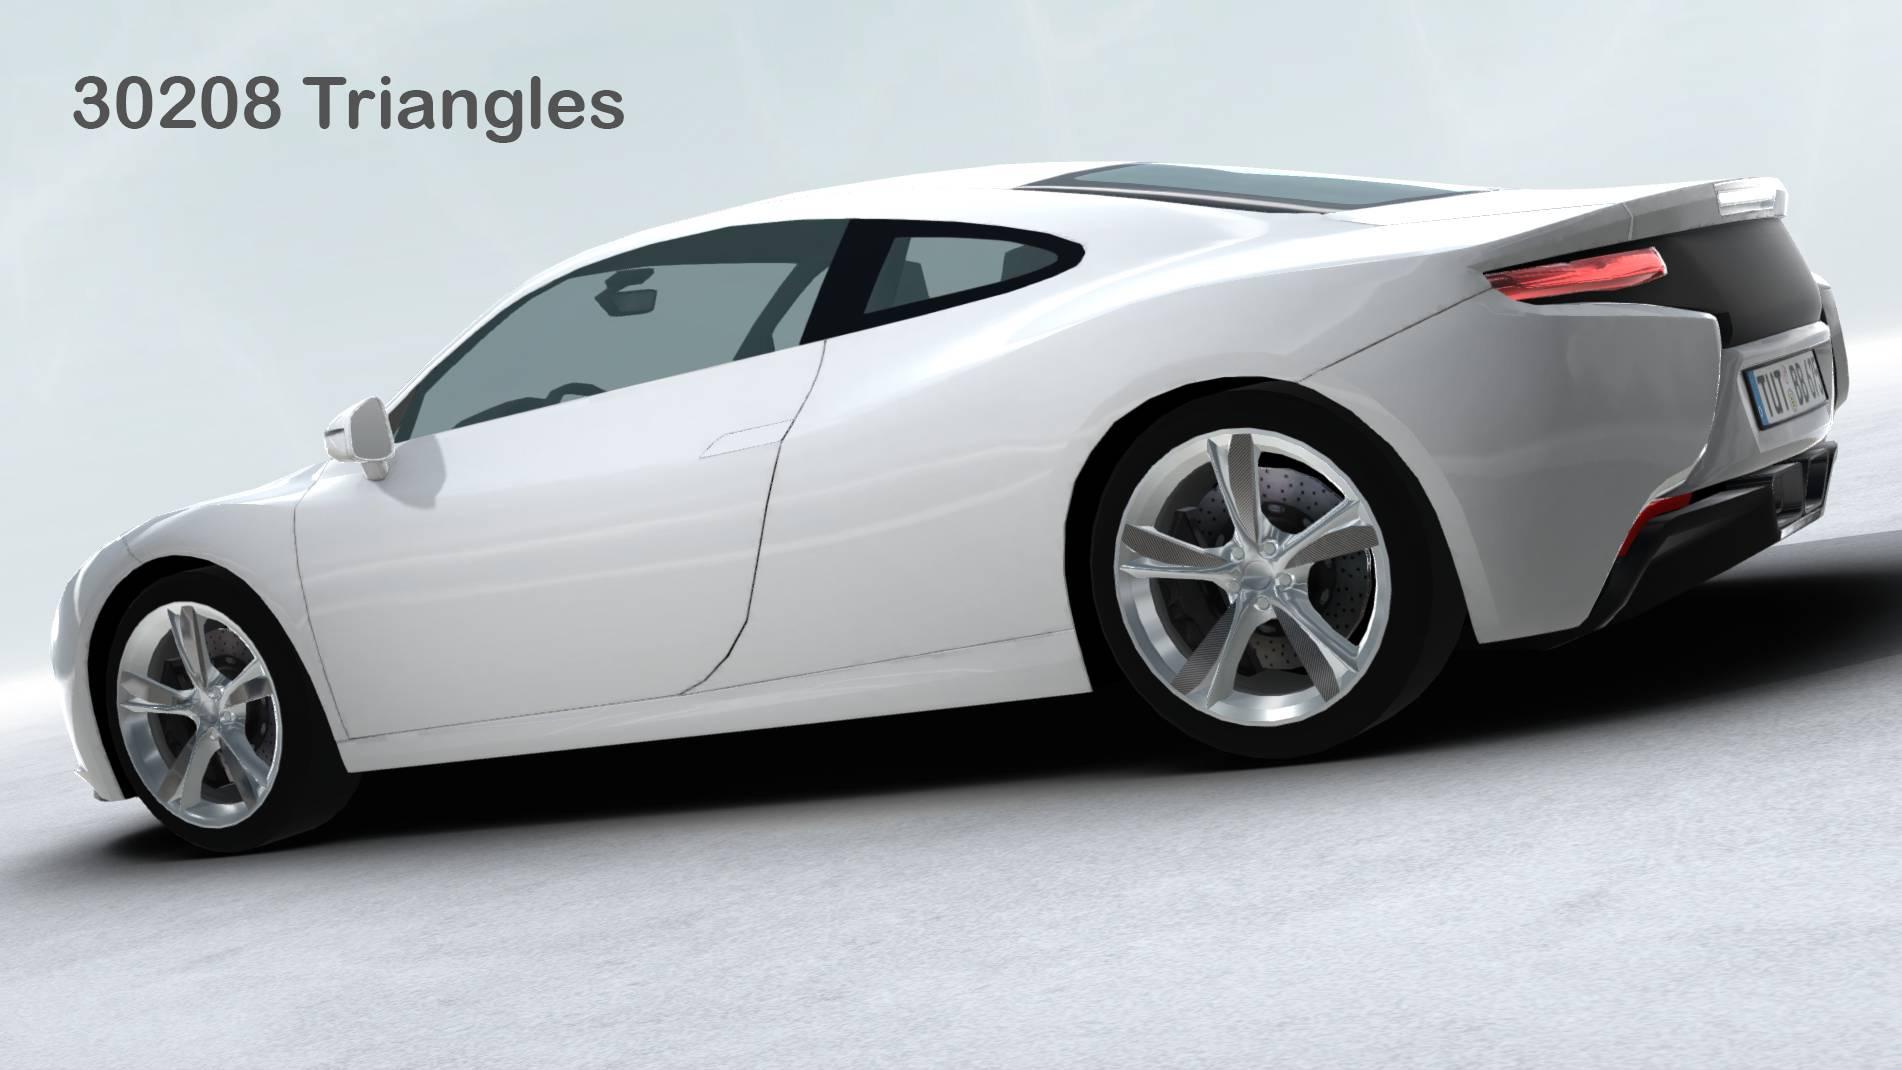 generic sports car realtime 3d model 3ds max fbx c4d lwo ma mb other obj 217743